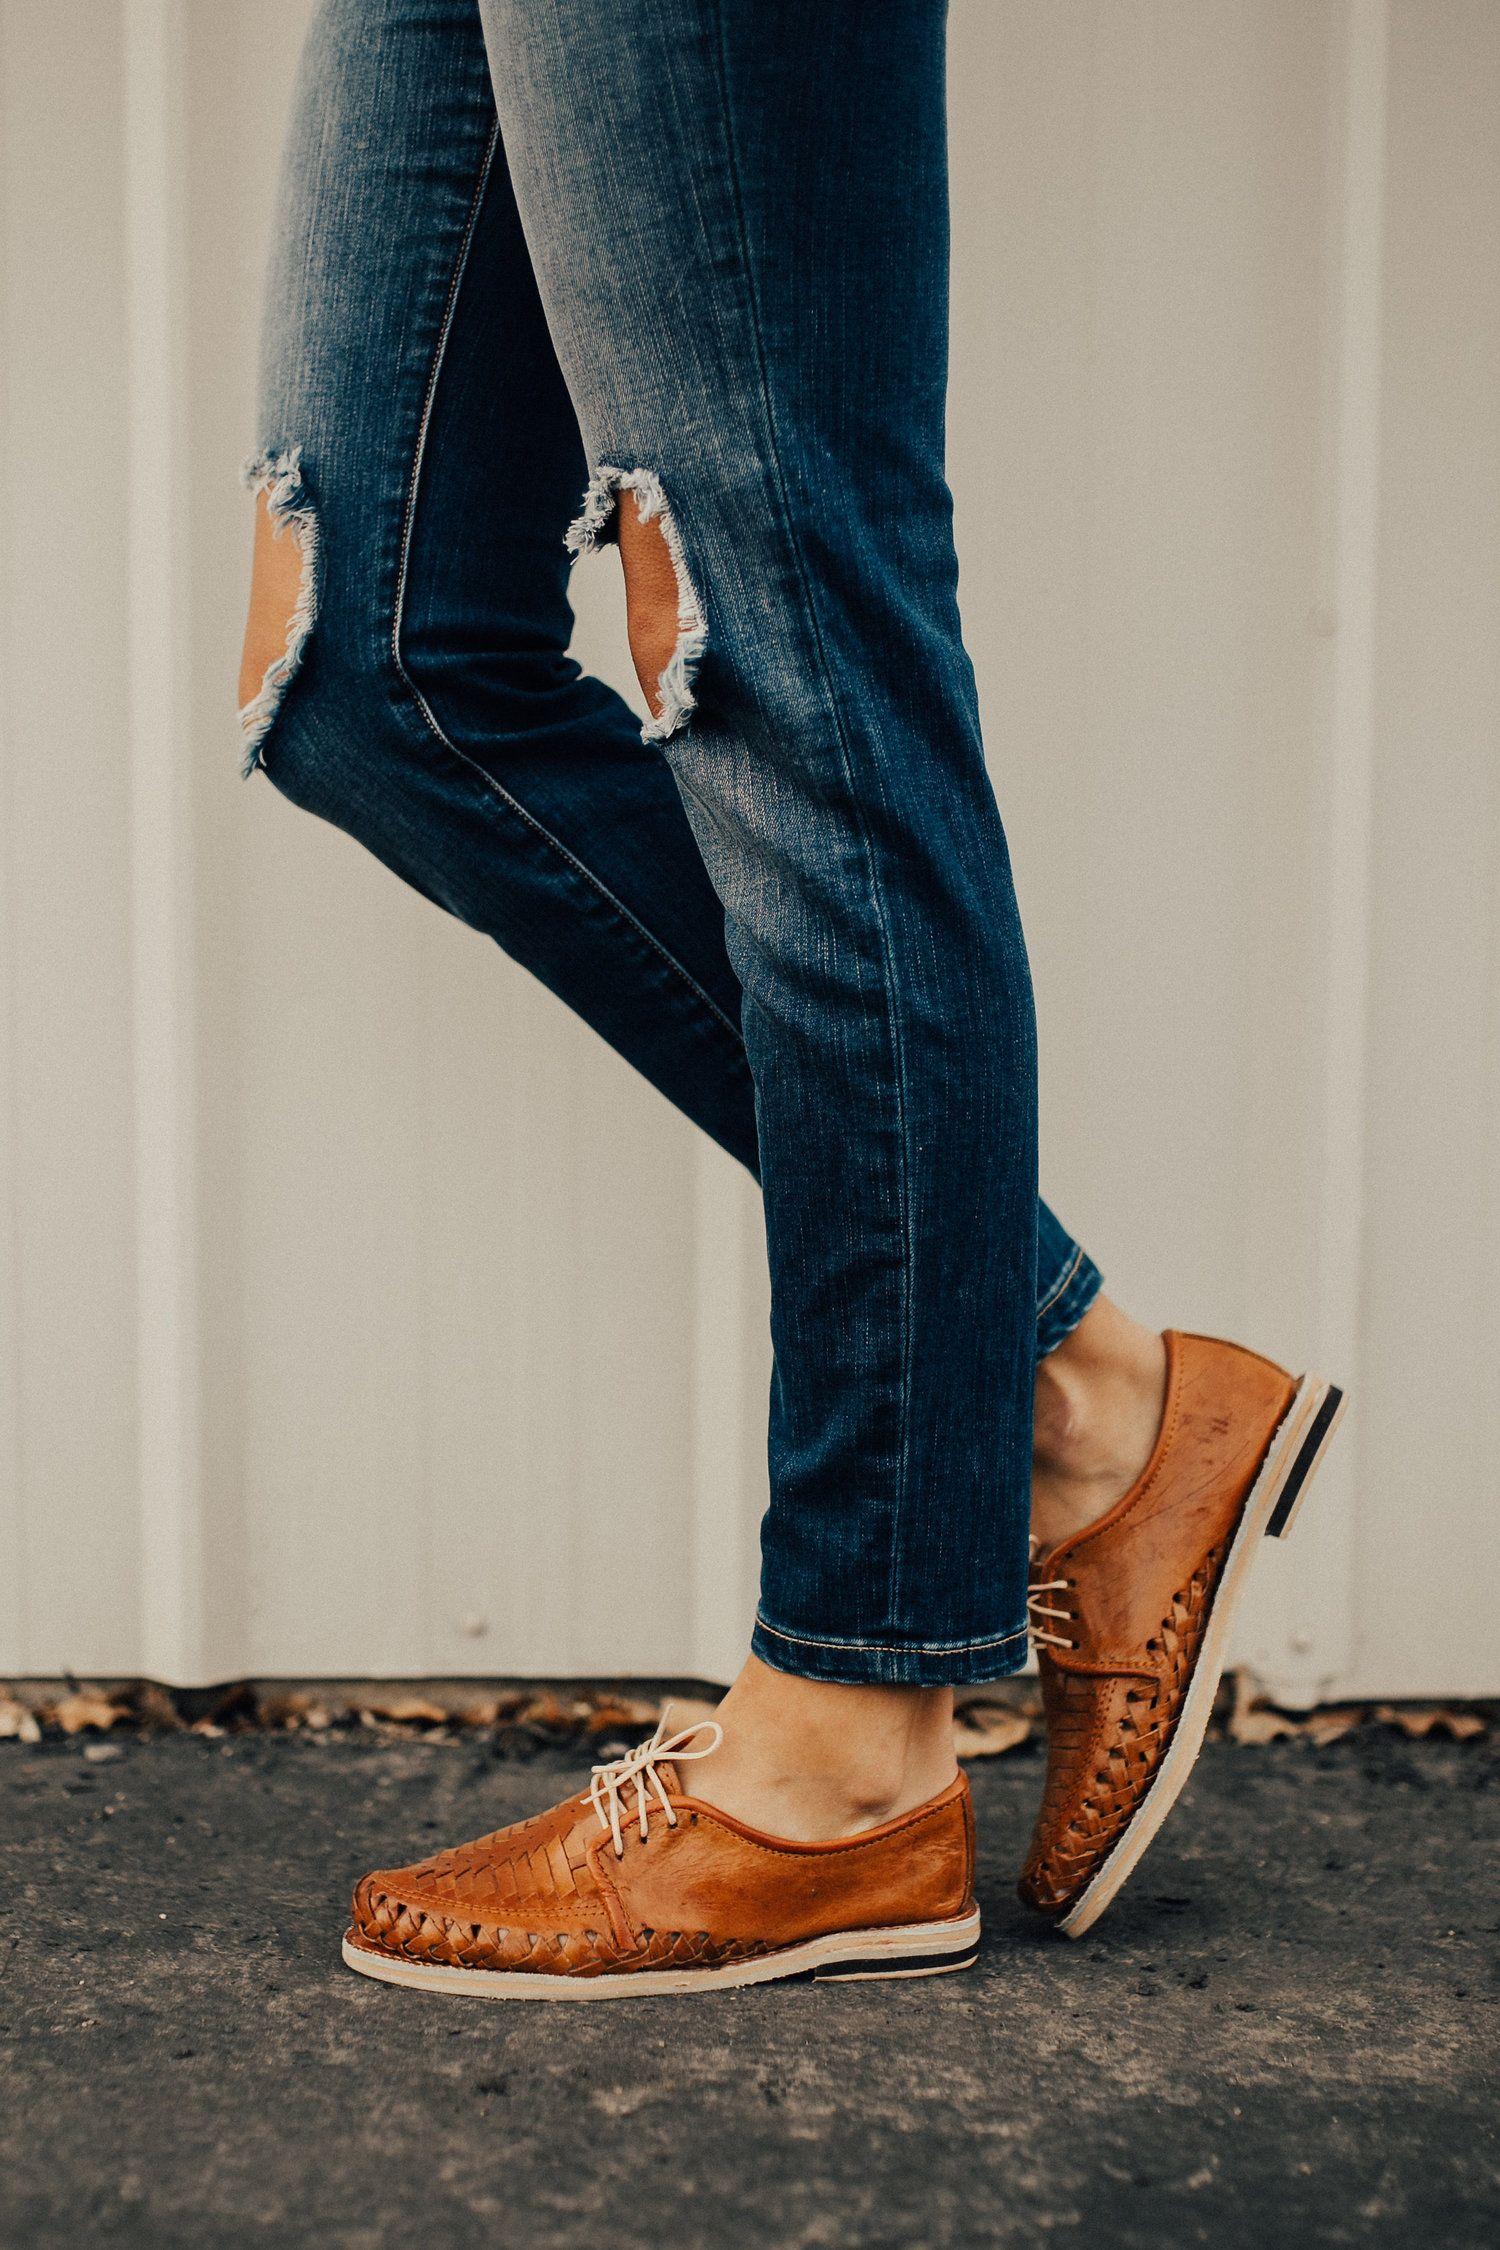 d655e2688f86 Leather Close Toed Sandals